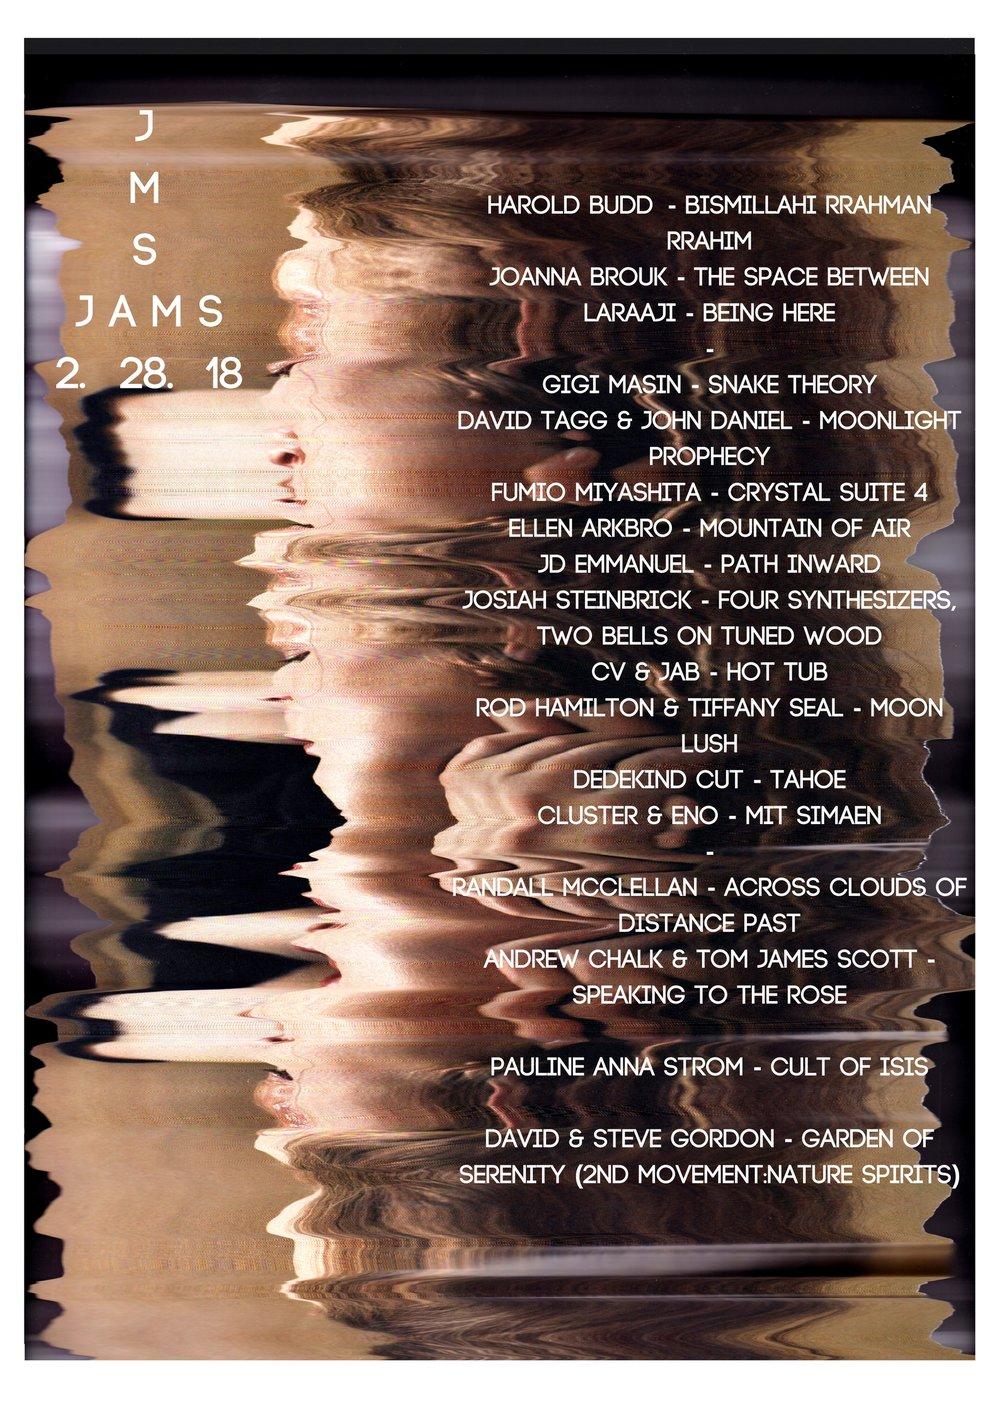 Harold Budd - Bismillahi Rrahman RrahimJoanna Brouk - The Space BetweenLaraaji - Being Here-Gigi Masin - Snake TheoryDavid Tagg & John Daniel - Moonlight ProphecyFumio Miyashita - Crystal Suite 4Ellen Arkbro - Mount (2).jpg